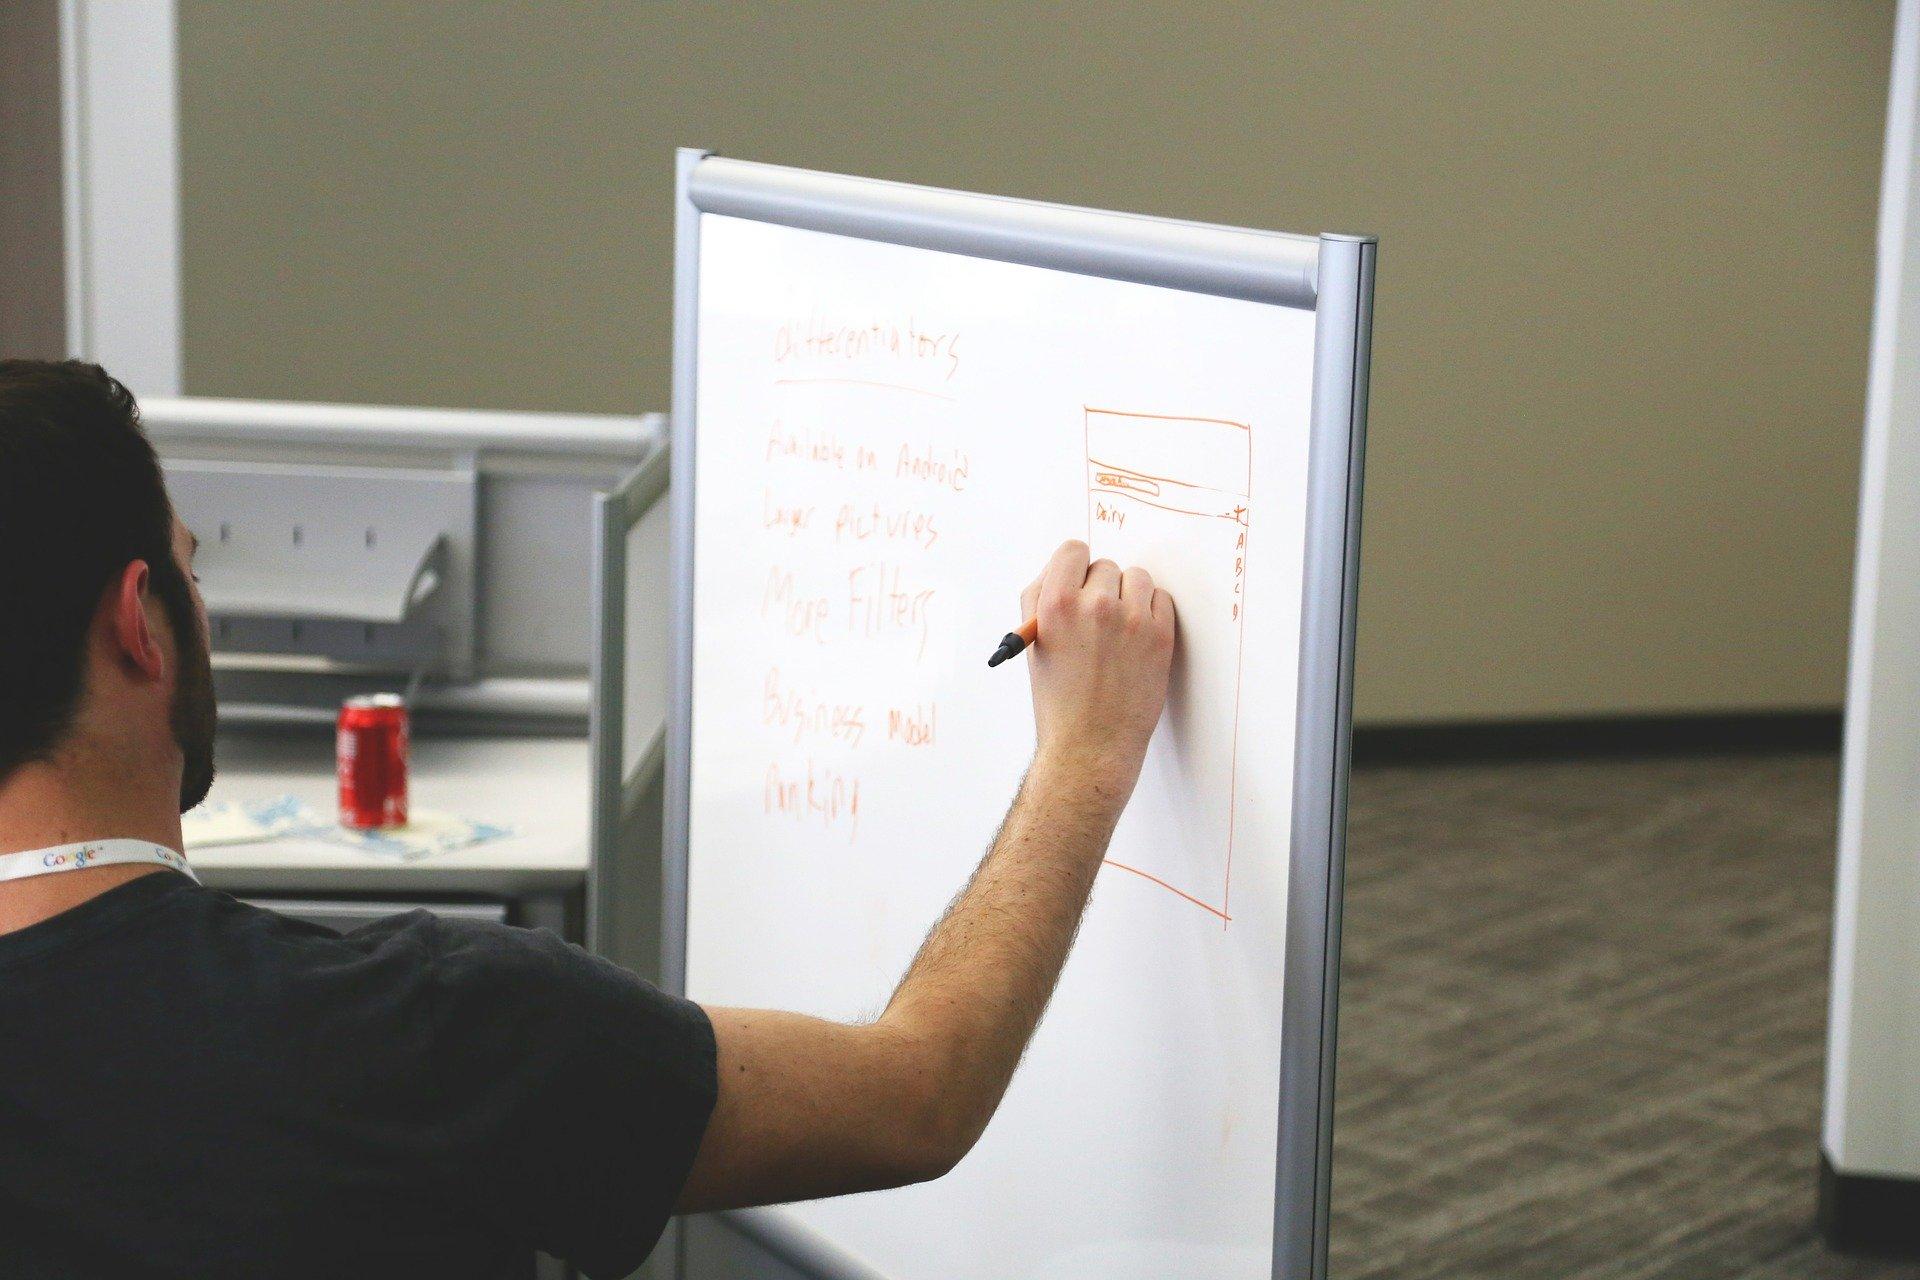 Explanation on whiteboard